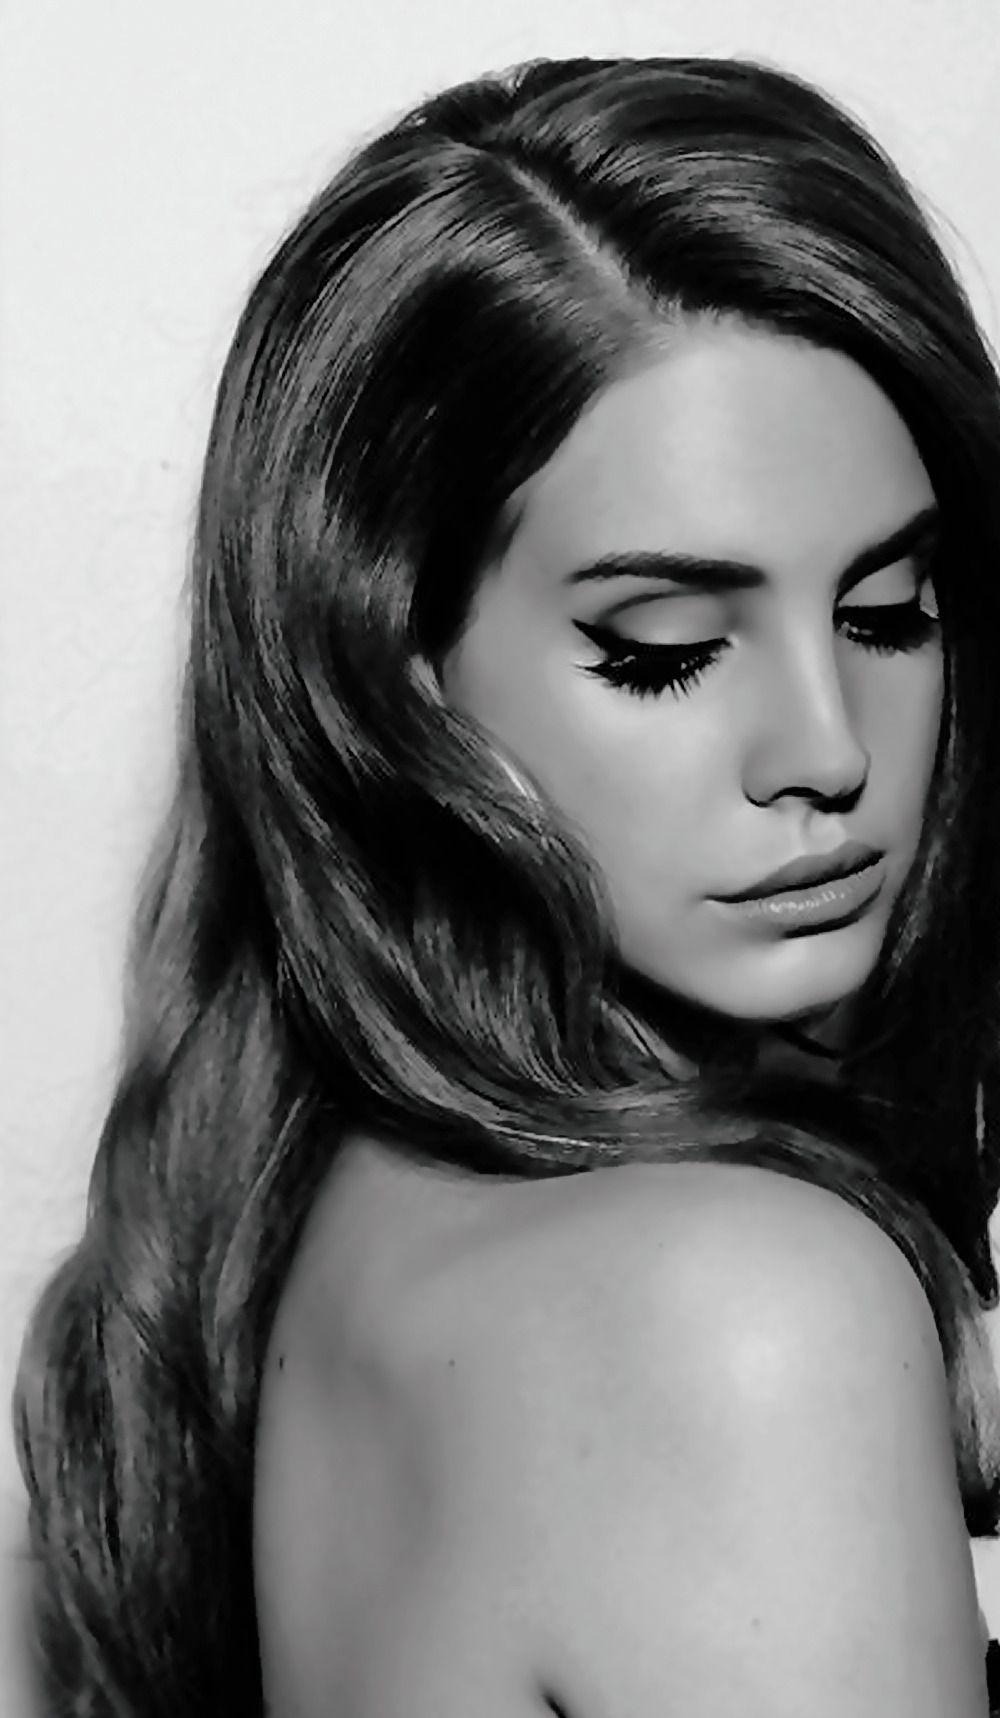 Lana Del Rey Wallpaper Ldr In 2019 Lana Del Rey Lana Del